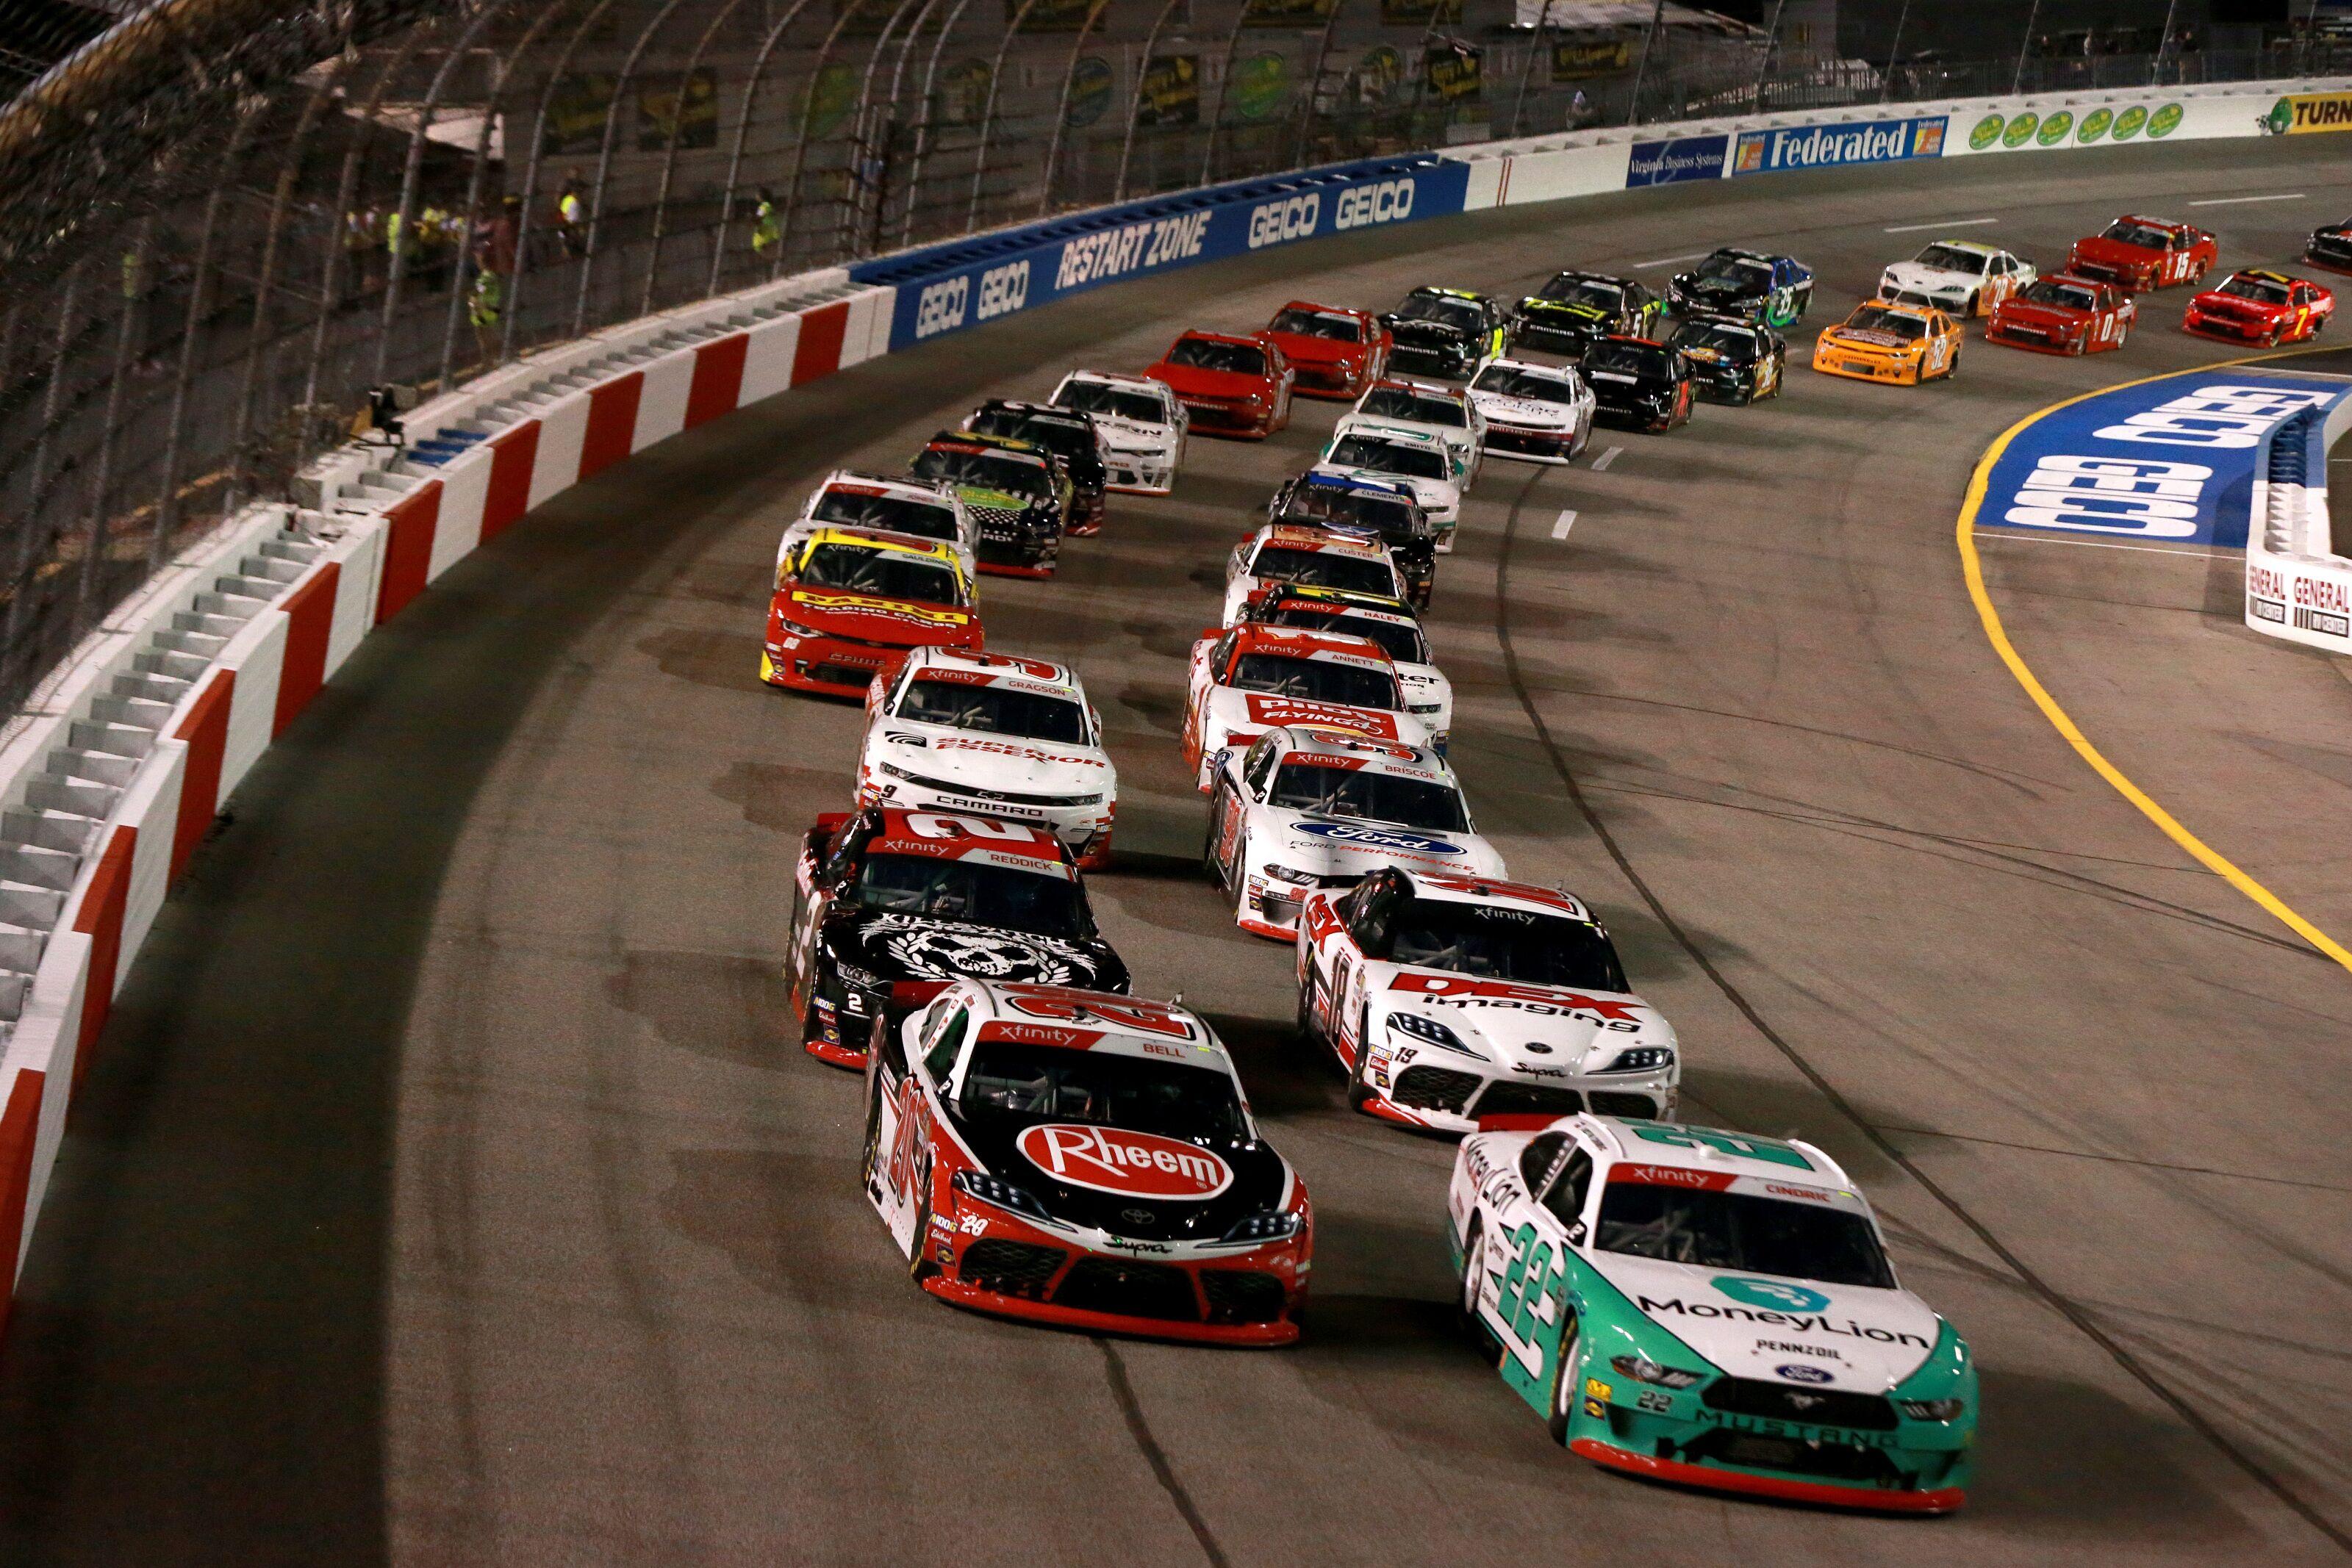 NASCAR Xfinity Series: Start times, networks revealed for 2020